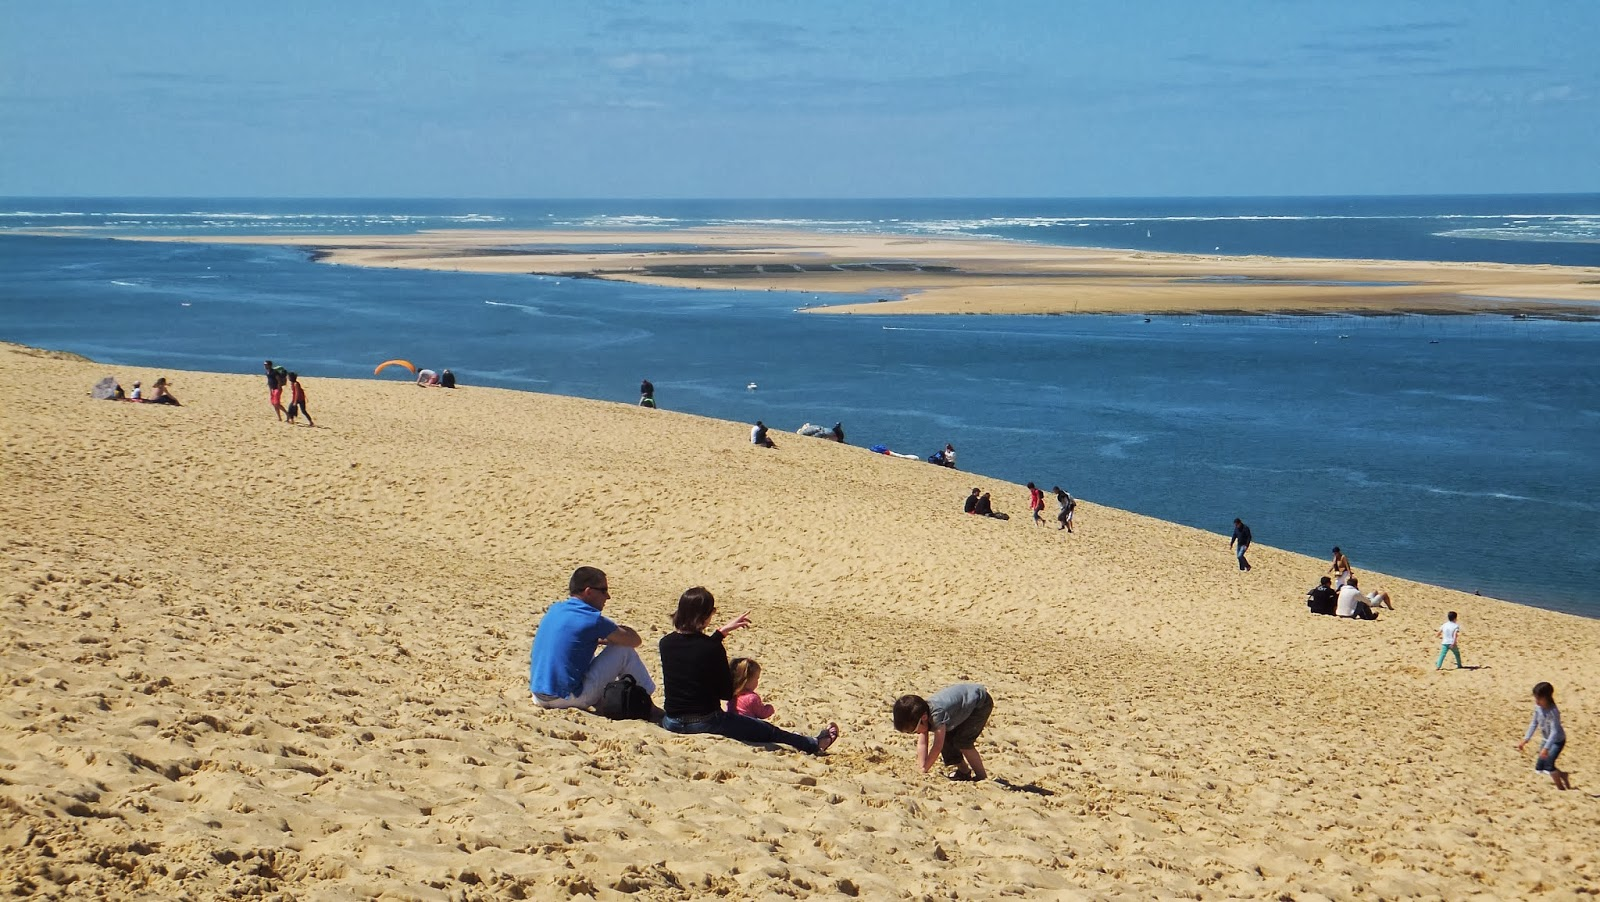 Bassin Arcachon, Pyla, Gran Duna de Pilat, Arcachon, Francia, Elisa N, Blog de Viajes, Lifestyle, Travel